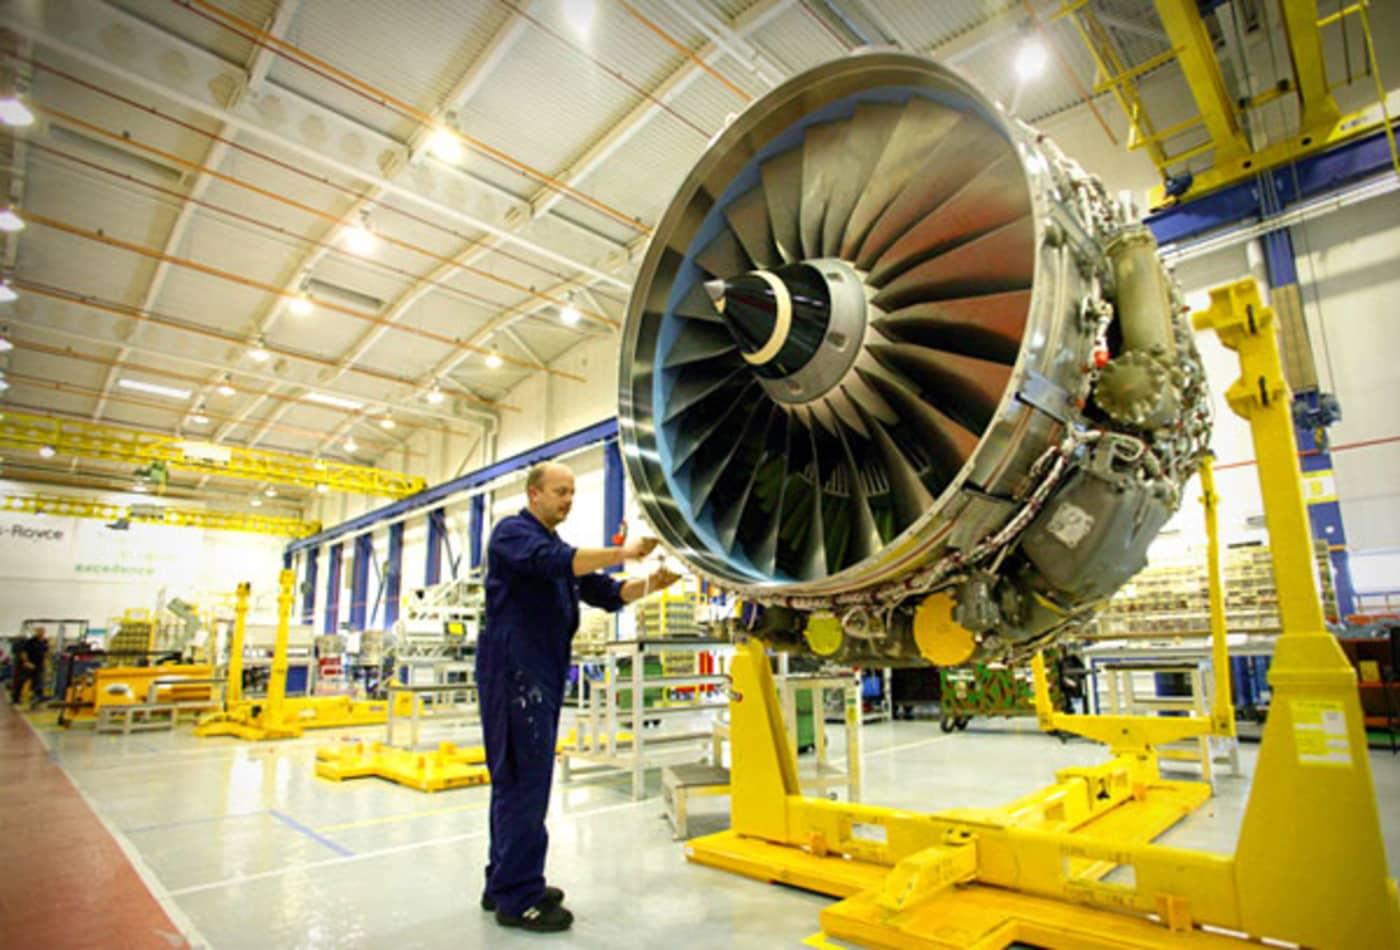 SS_Disappearing_Jobs_Aerospace_Engineer.jpg